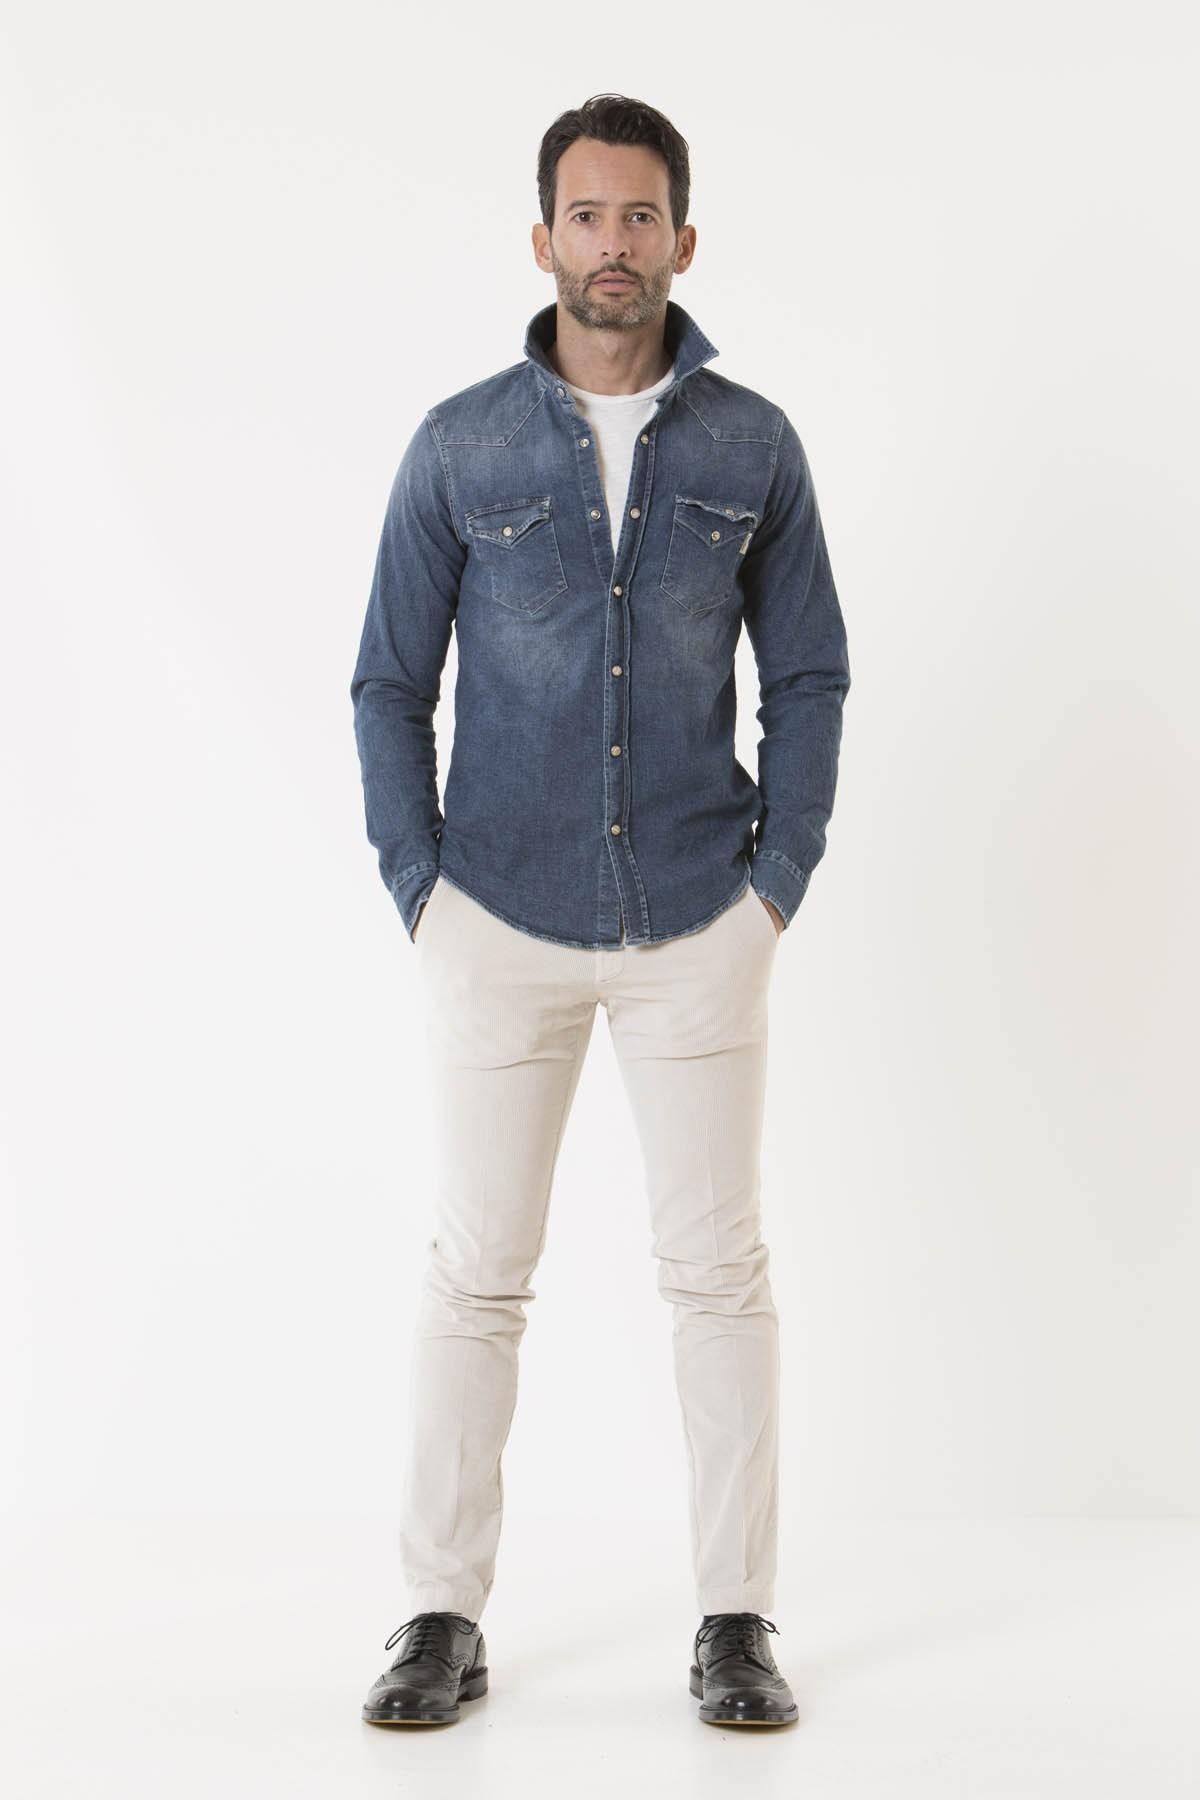 Camicia FOLGER per uomo ROY ROGER'S A/I 18-19